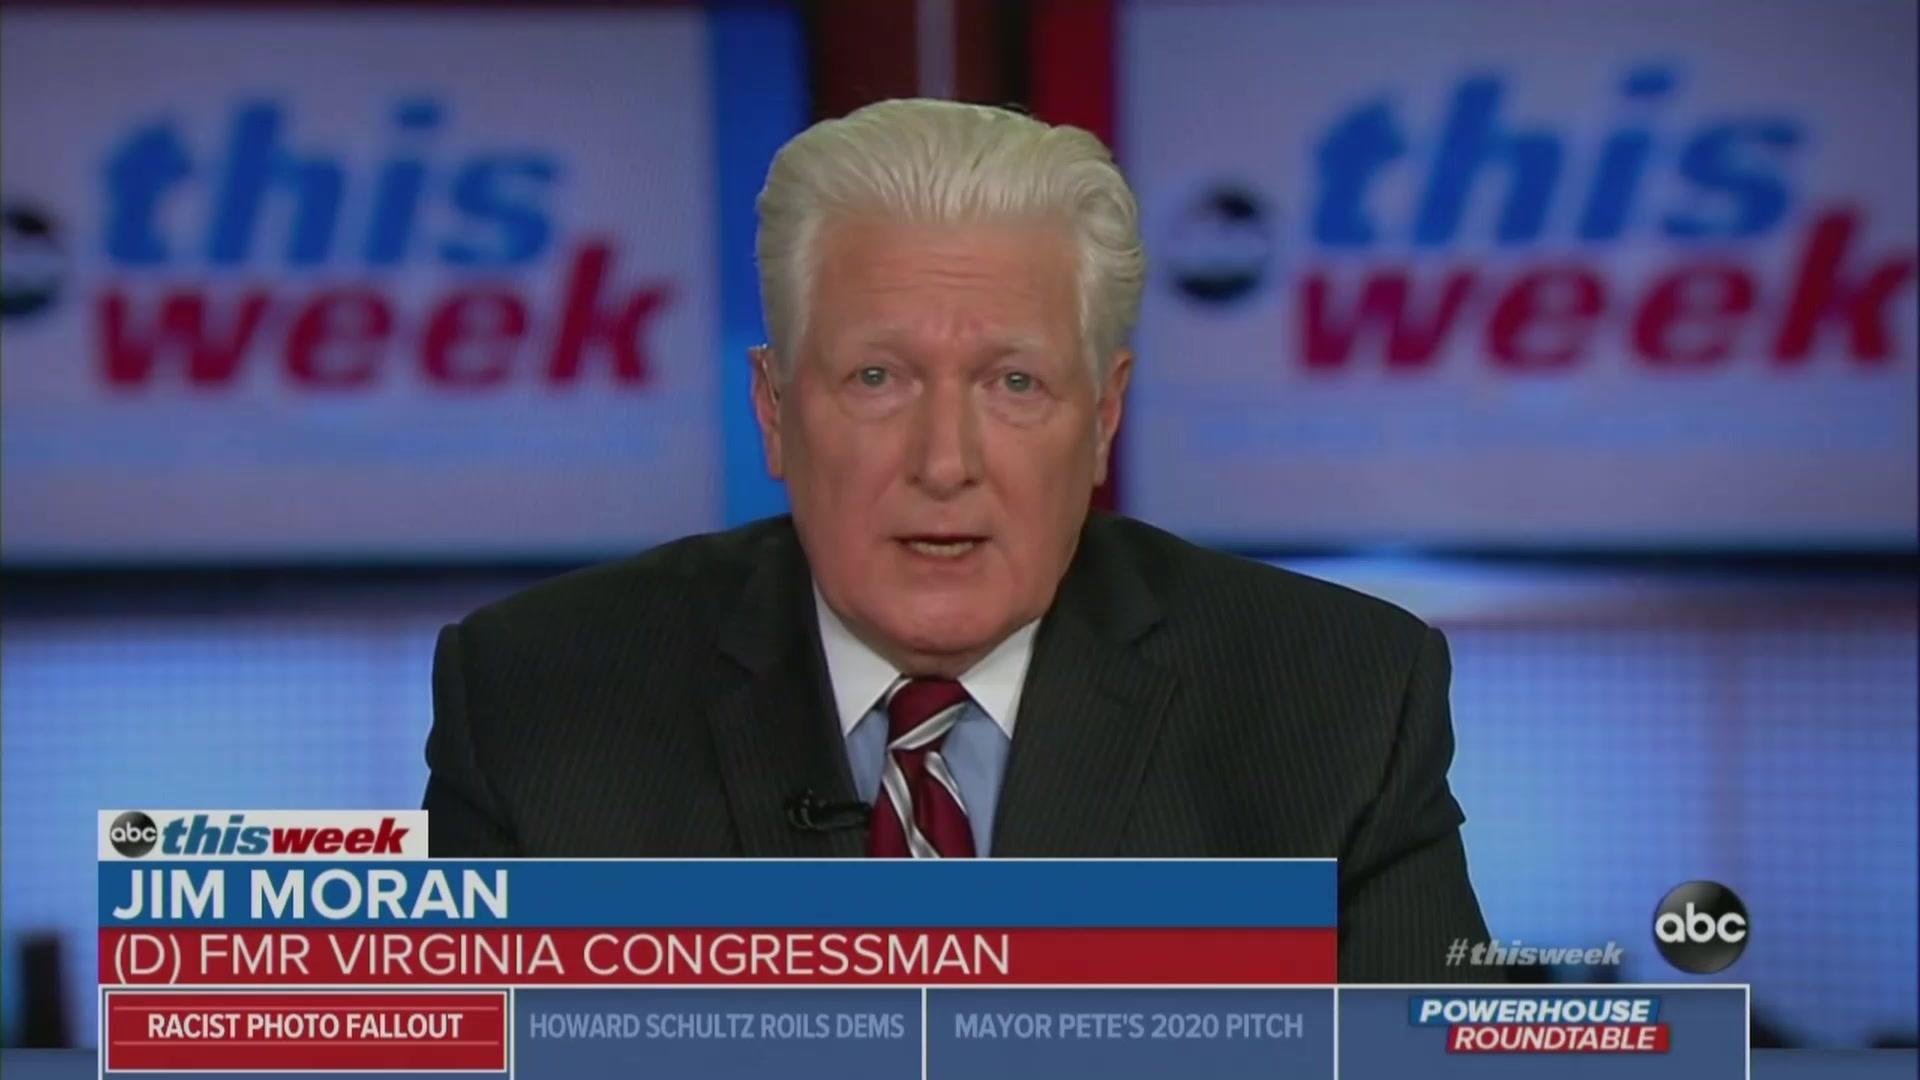 Former Virginia Congressman Backs Northam: Give Him A 'Chance To Prove Himself'